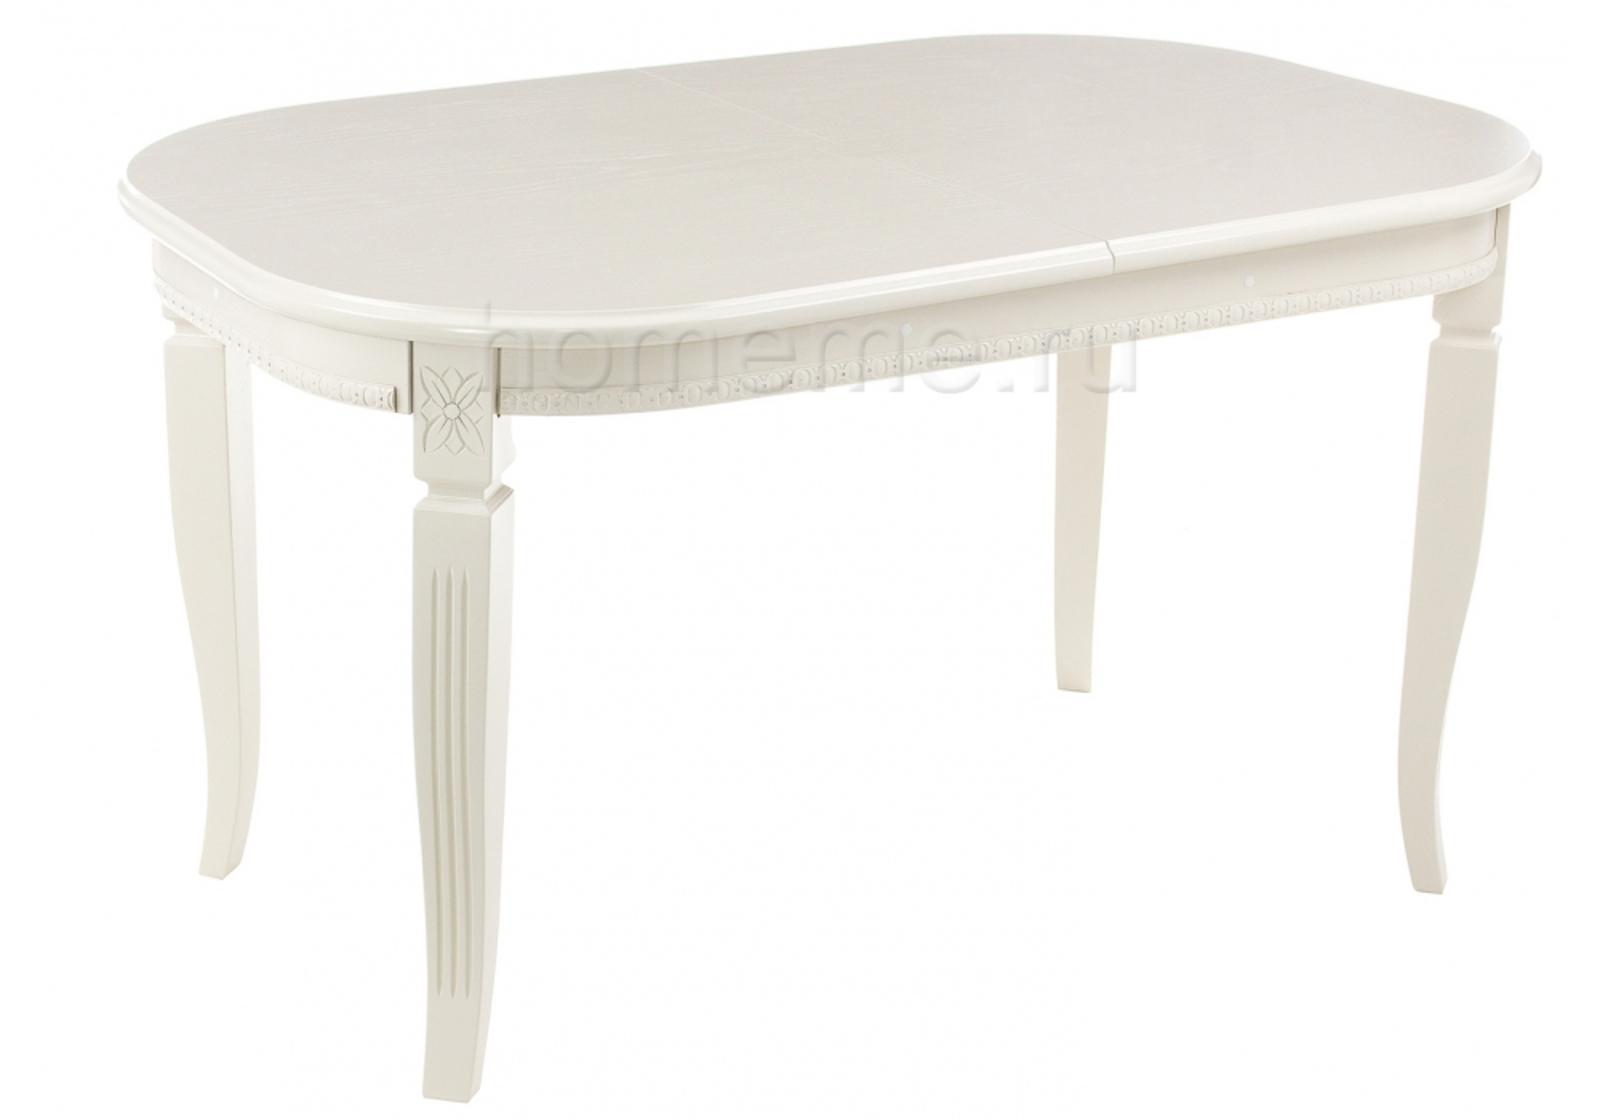 Стол деревянный Стол Romeo молочный без патины 270770 270770